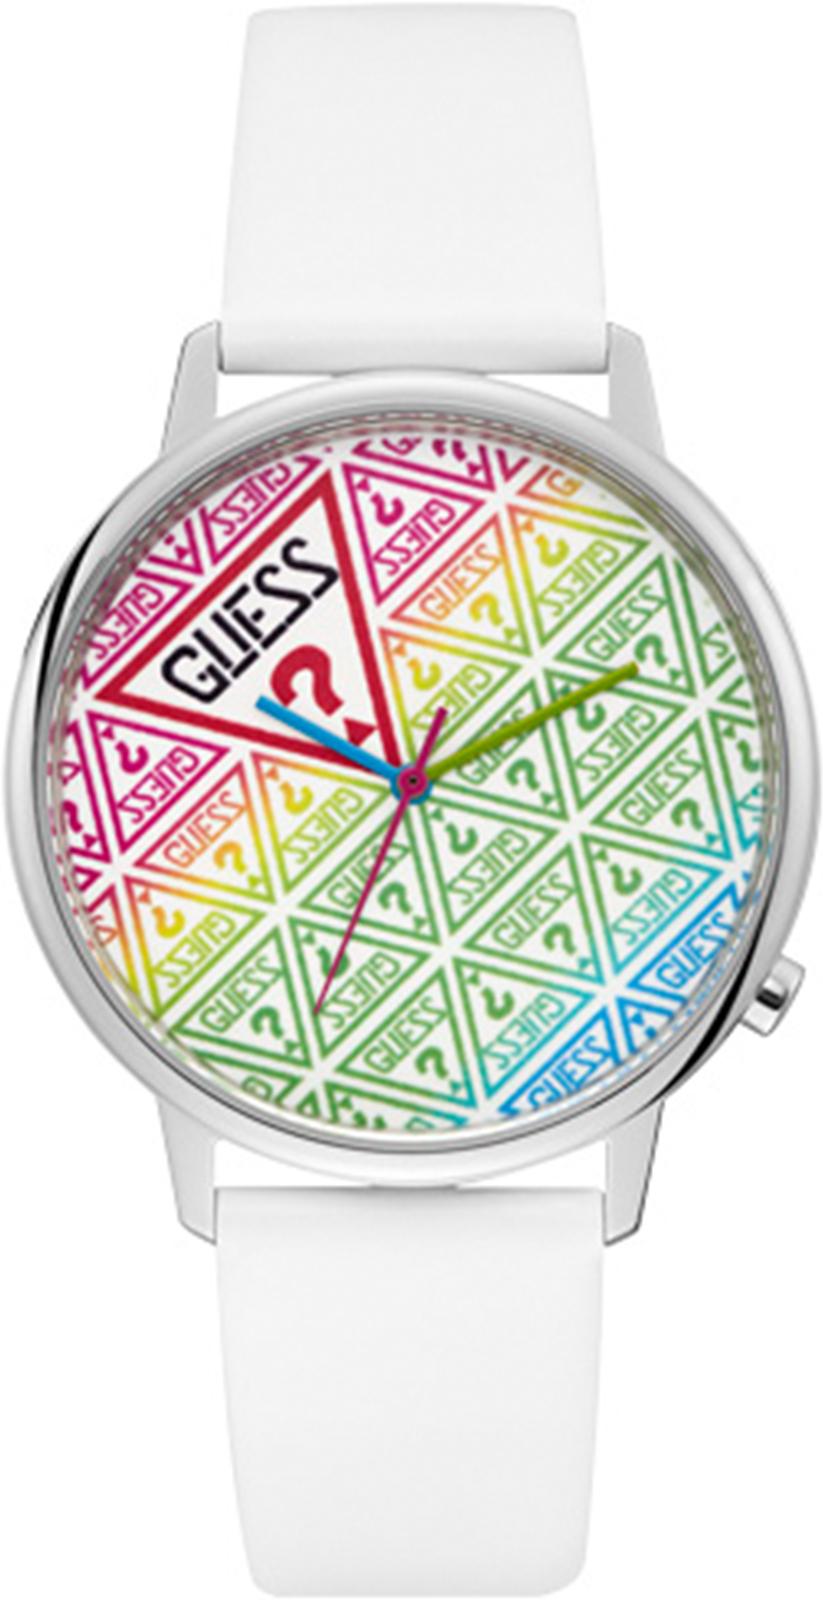 Наручные часы Guess Originals Hollywood + Highland наручные часы guess w0658g4